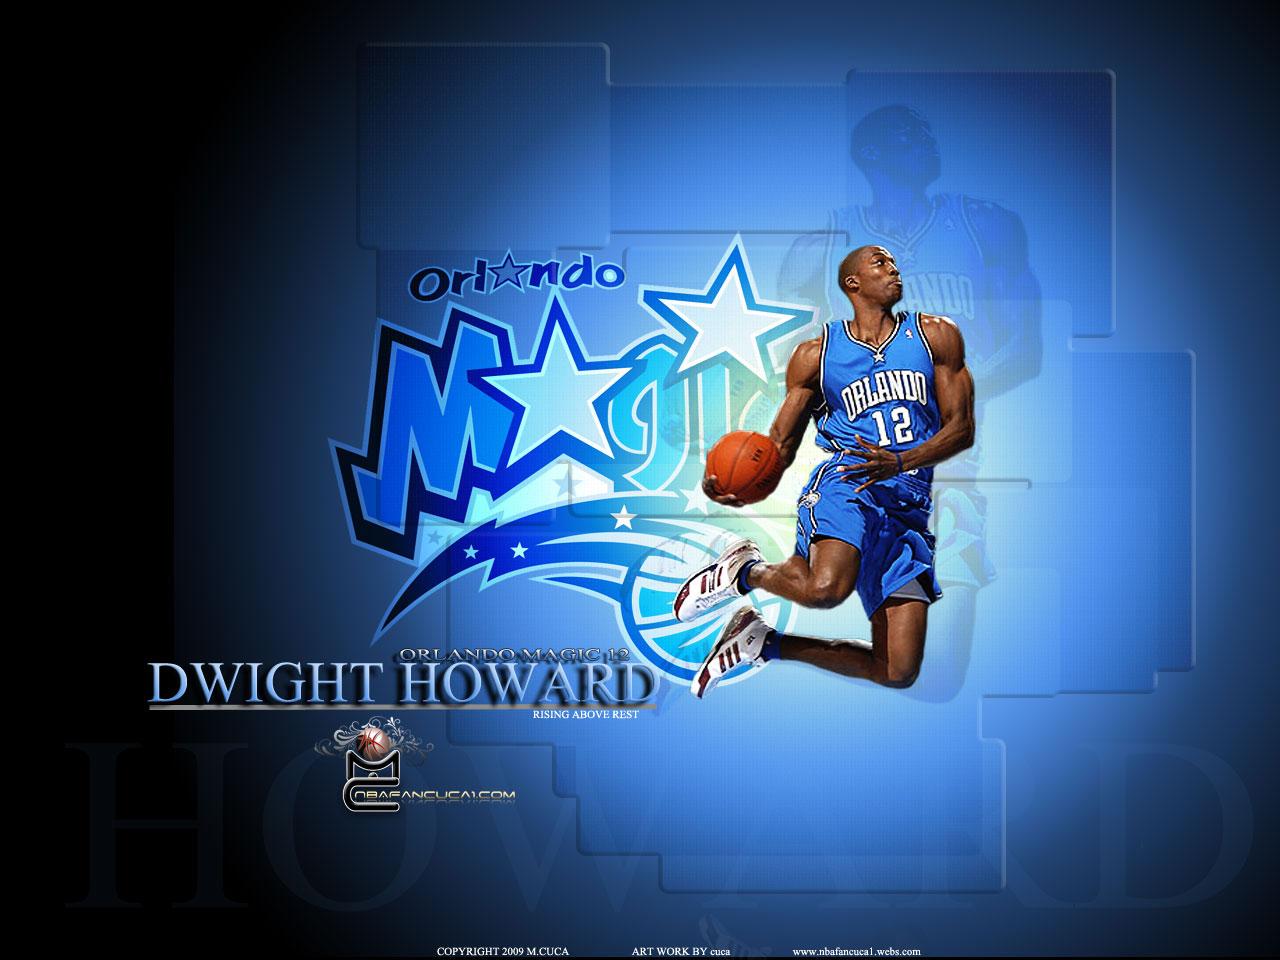 ... /BW4mso7VI_o/s1600/Dwight-Howard-Orlando-Magic-Wallpaper.jpg